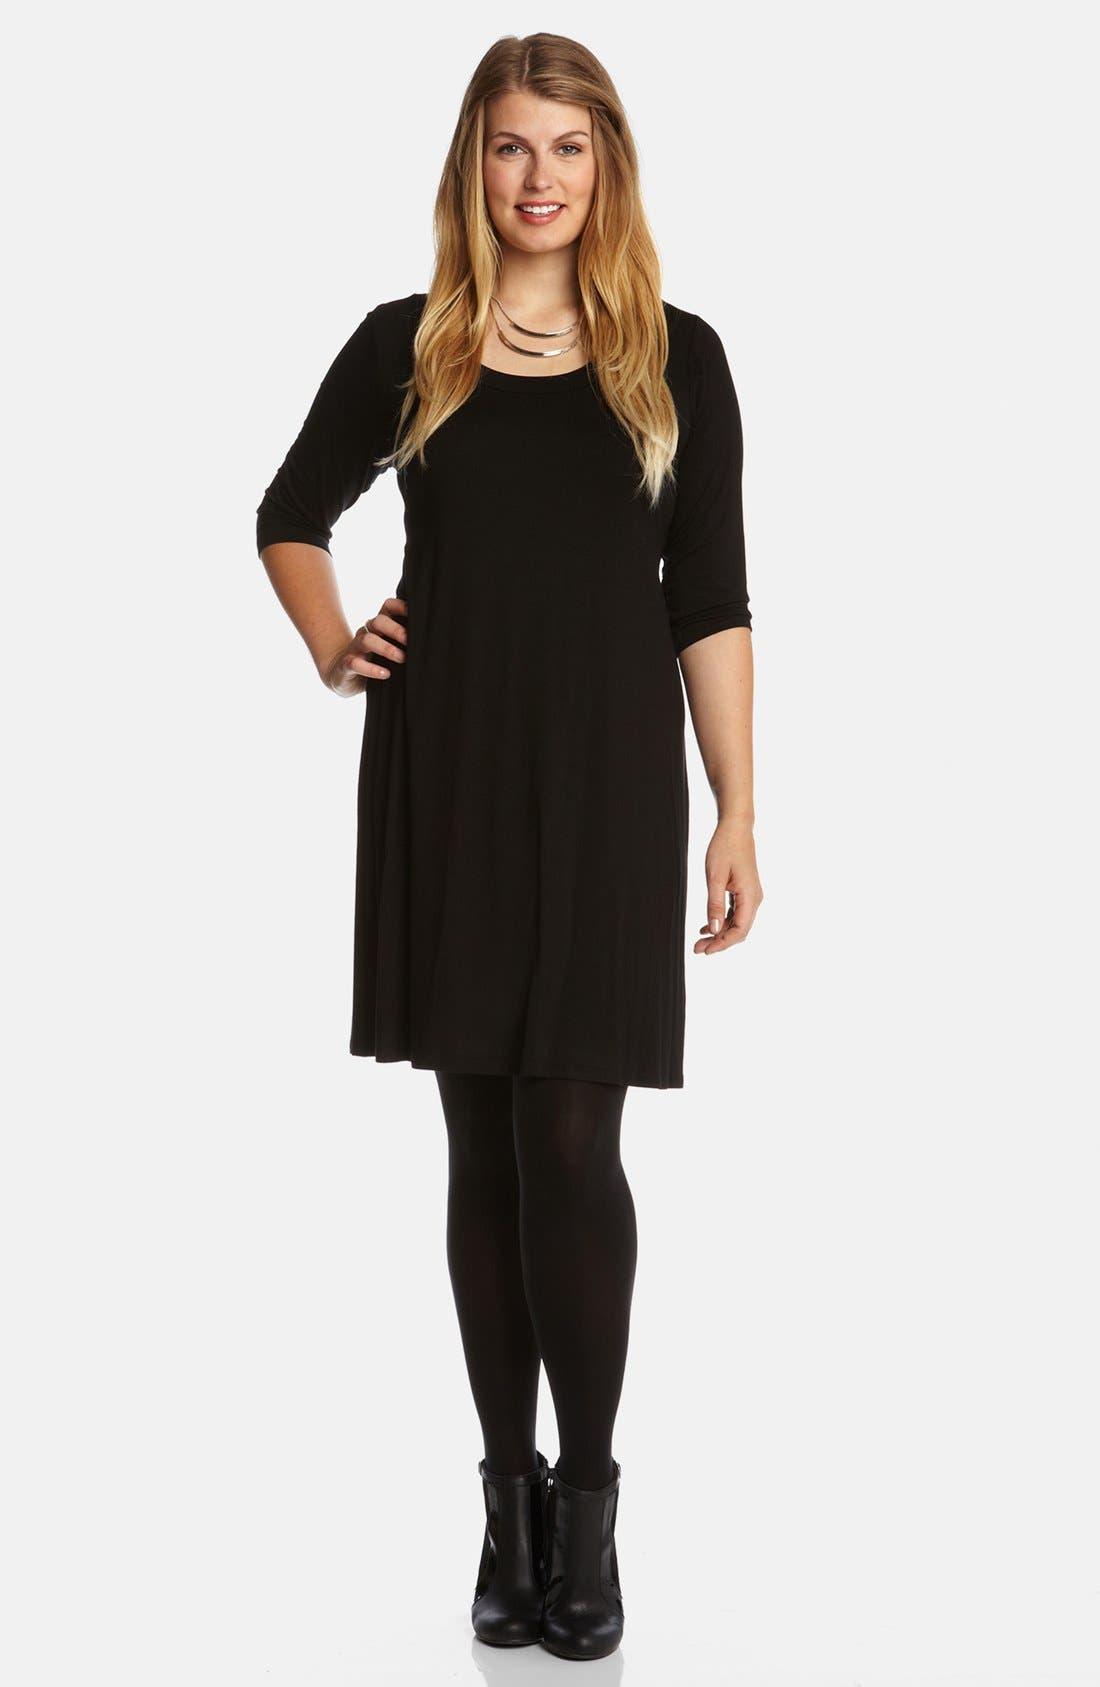 KAREN KANE, Scoop Neck Jersey Dress, Main thumbnail 1, color, BLACK